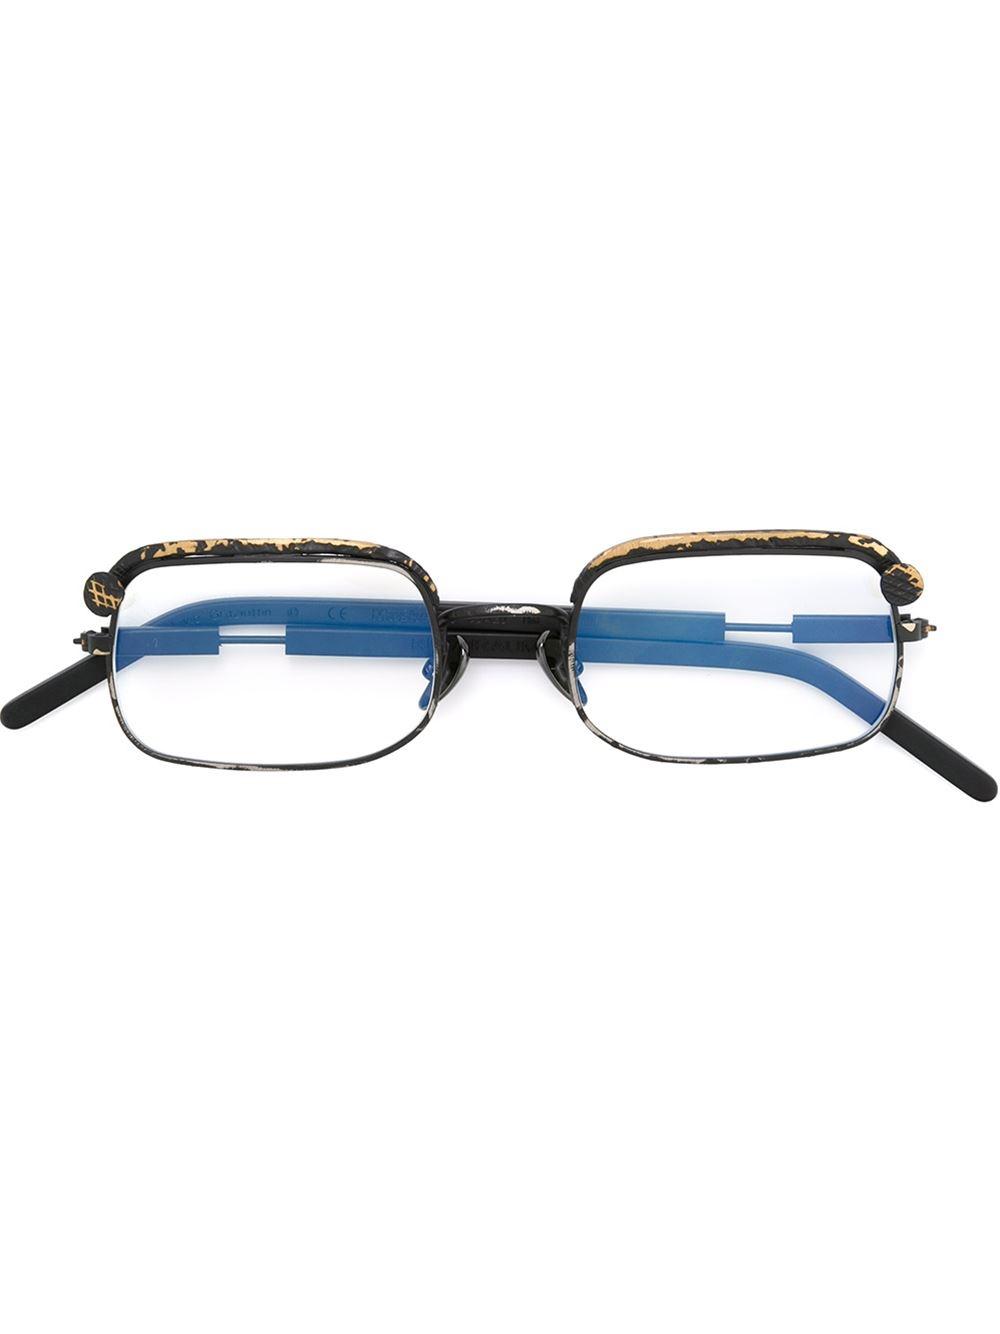 Kuboraum Distressed Rectangular Frame Glasses in Black Lyst